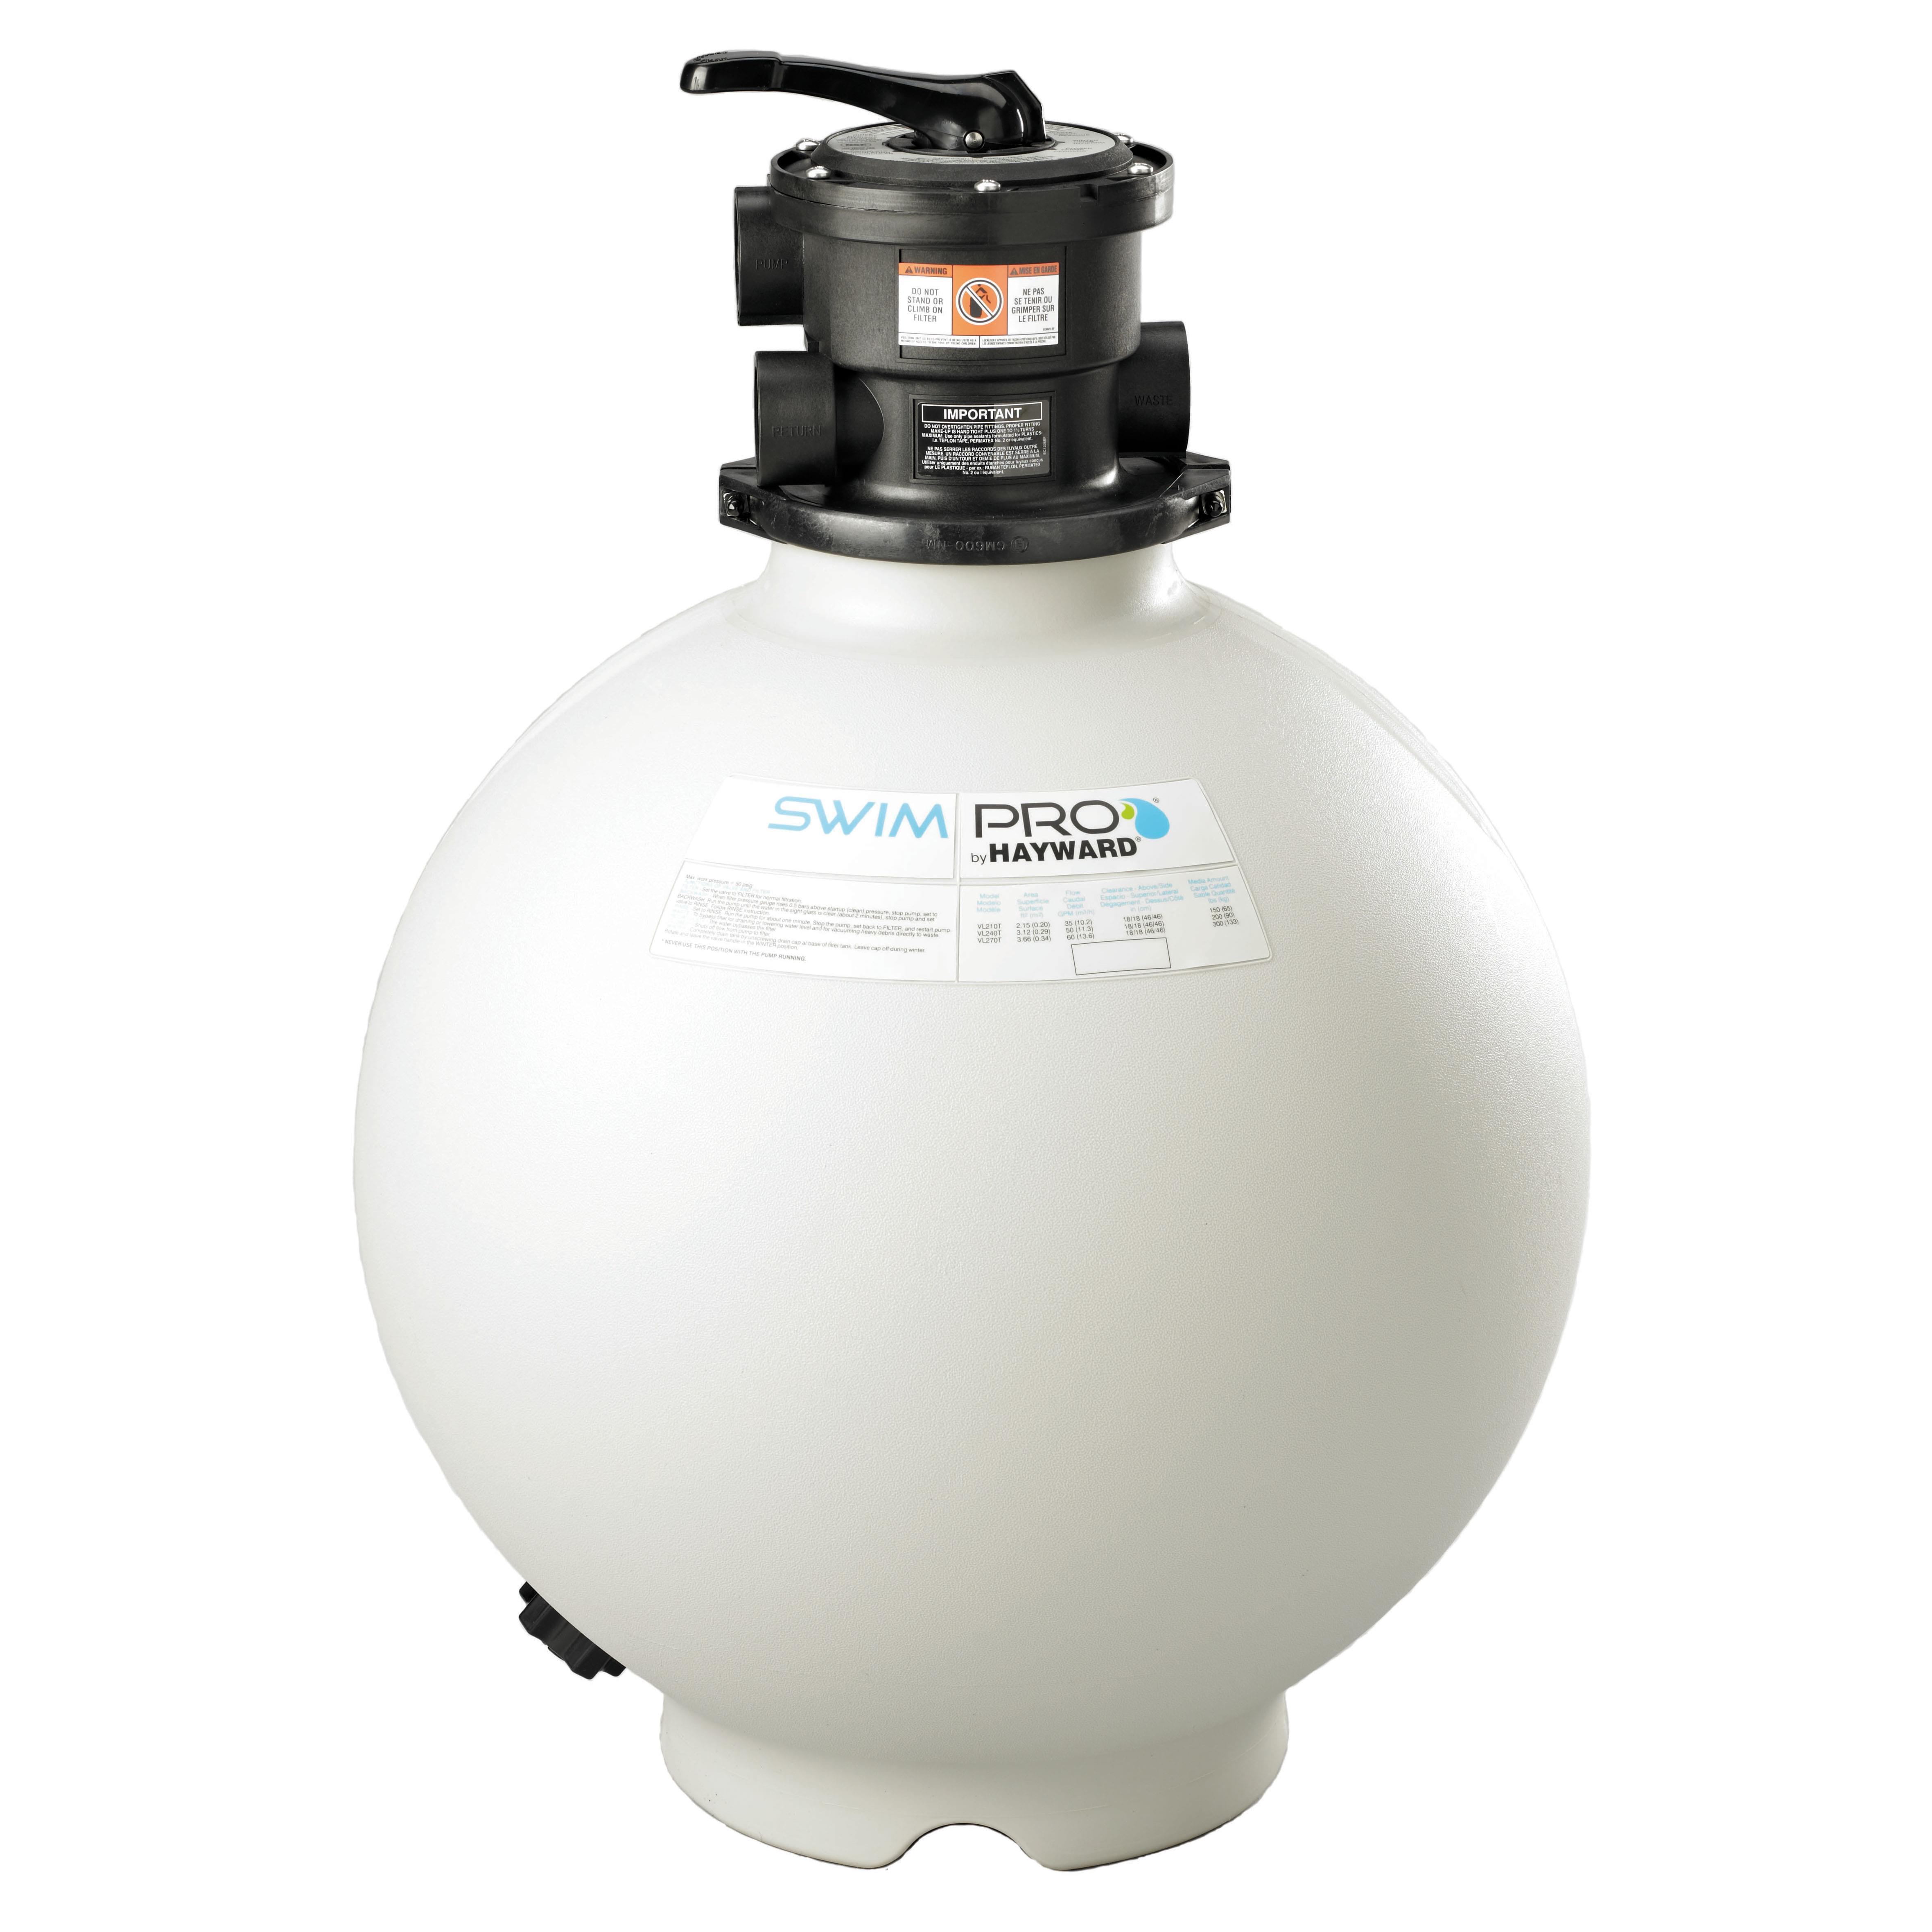 Hayward 24 inch swim pro sand filter with 6 way valve - Hayward pool equipment ...